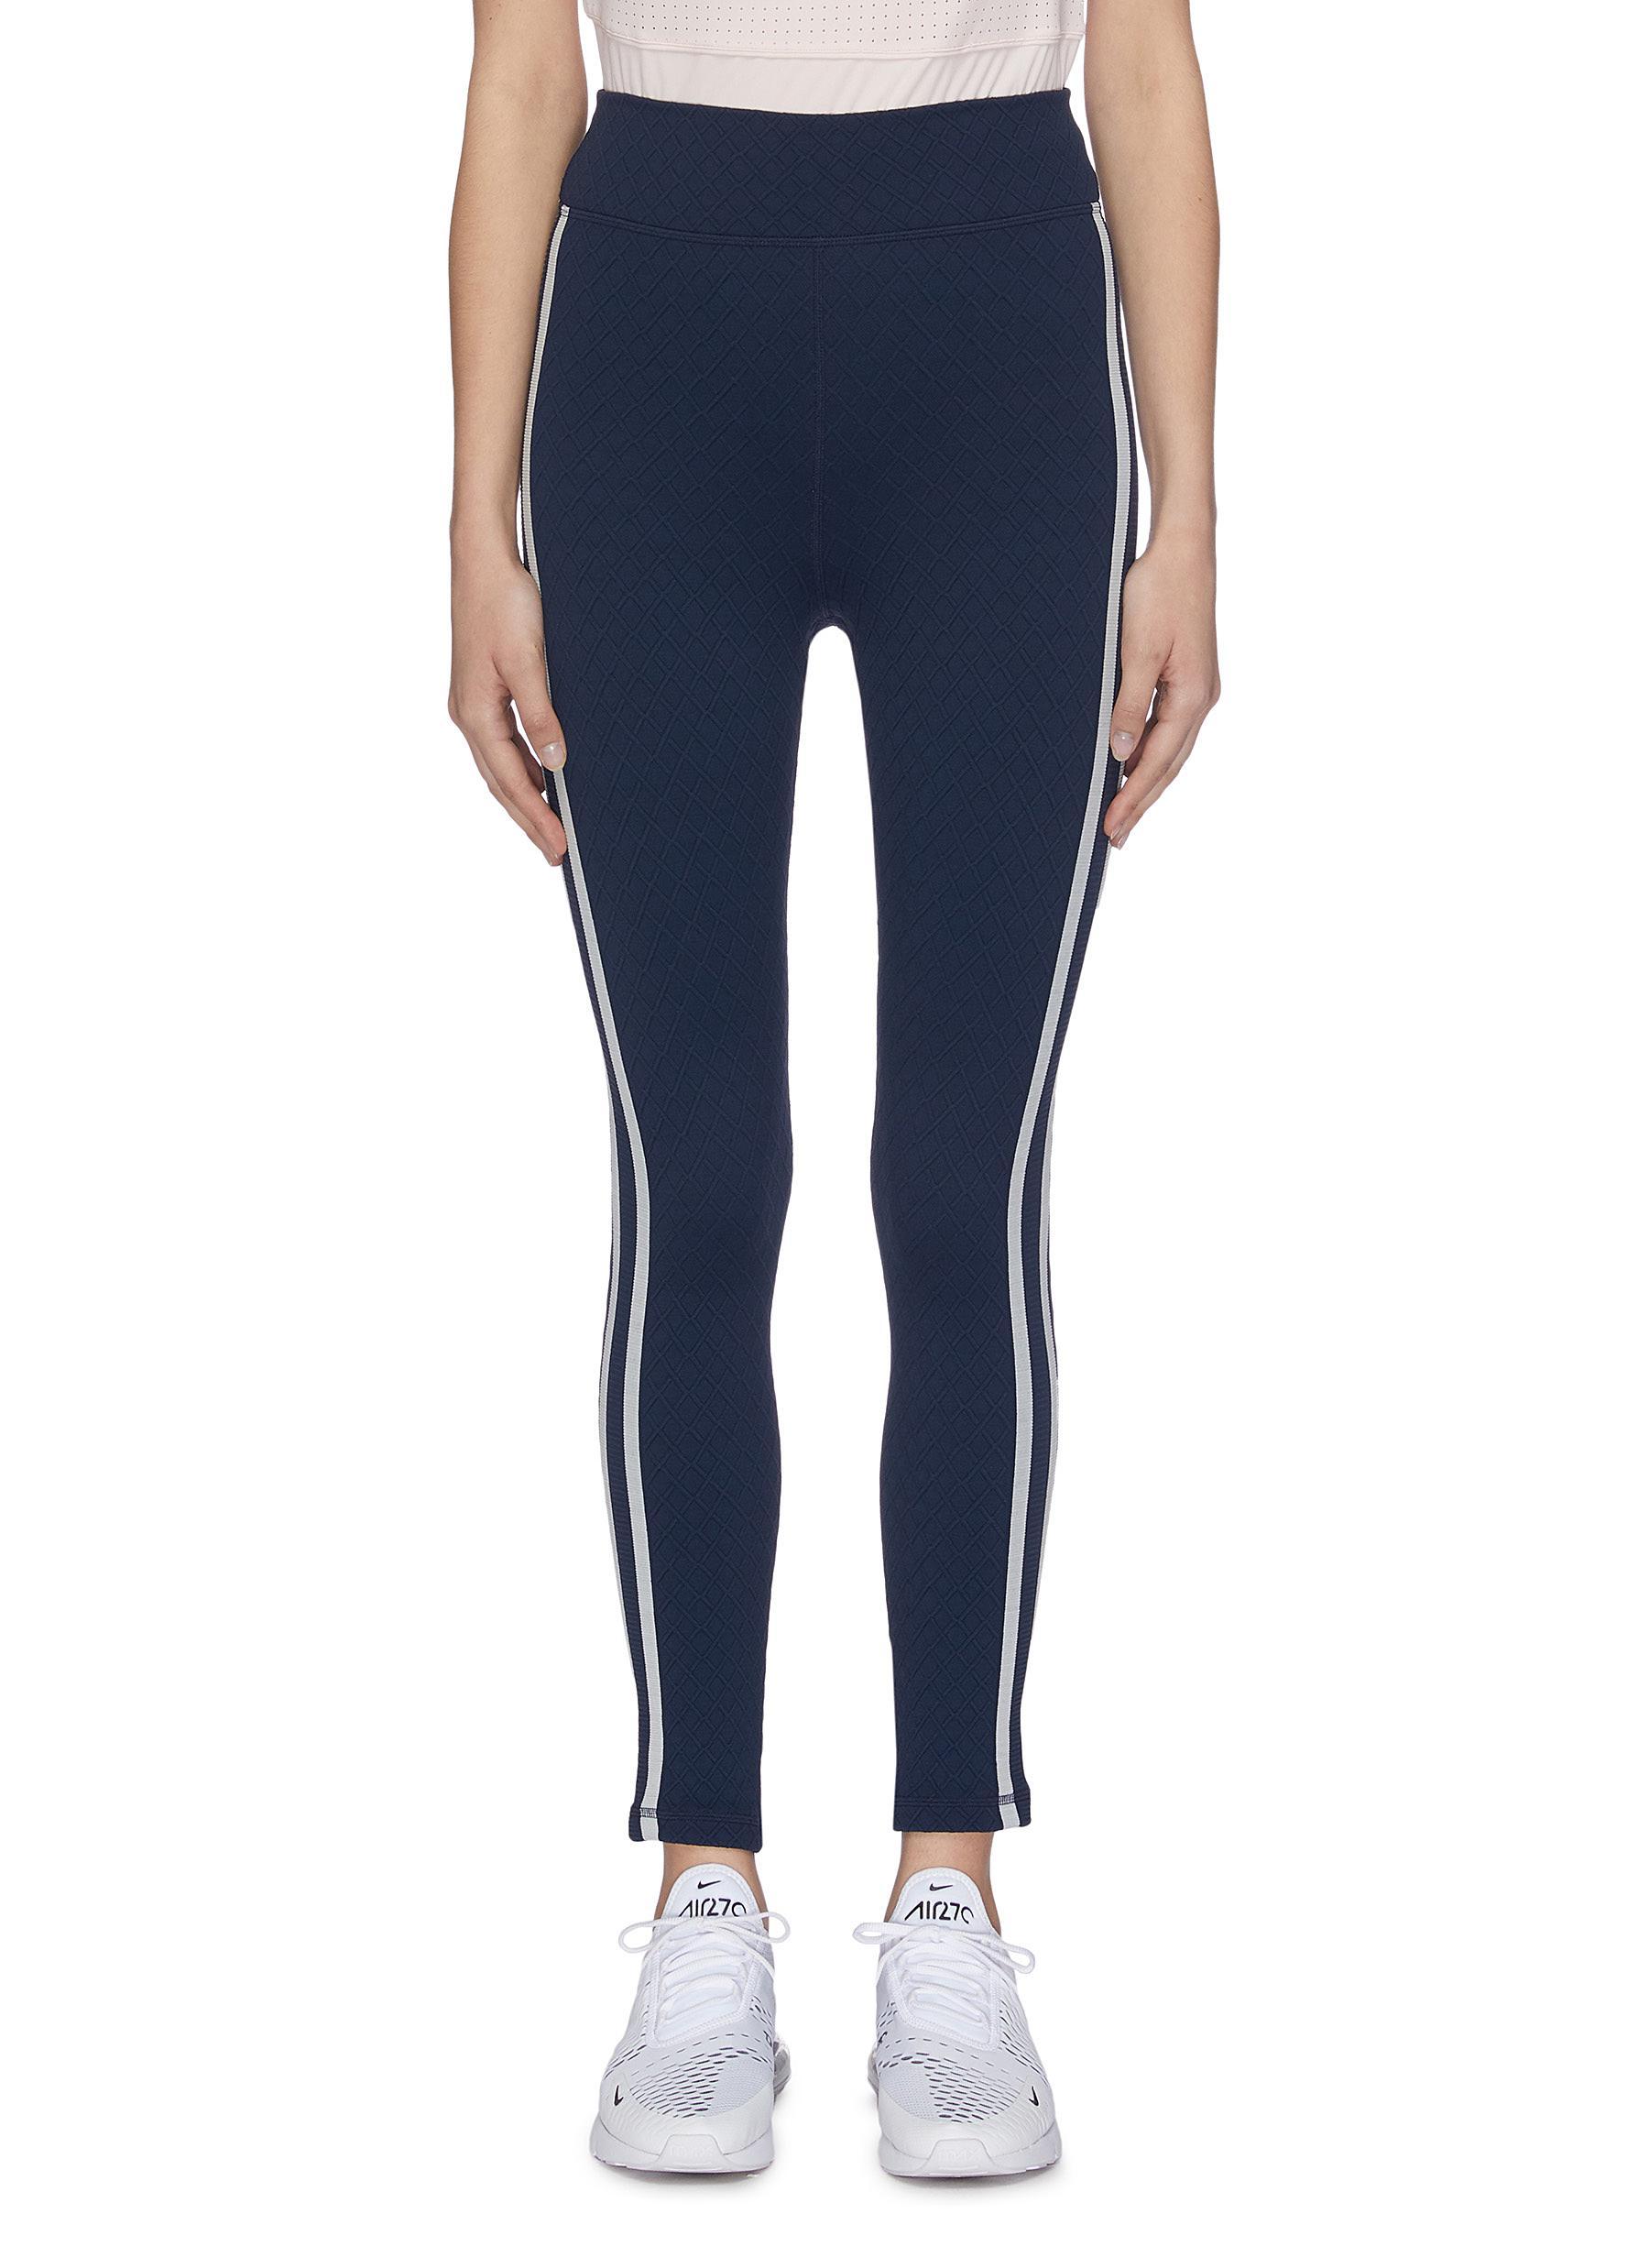 shop The Upside 'Jacquard Midi' stripe outseam performance leggings online